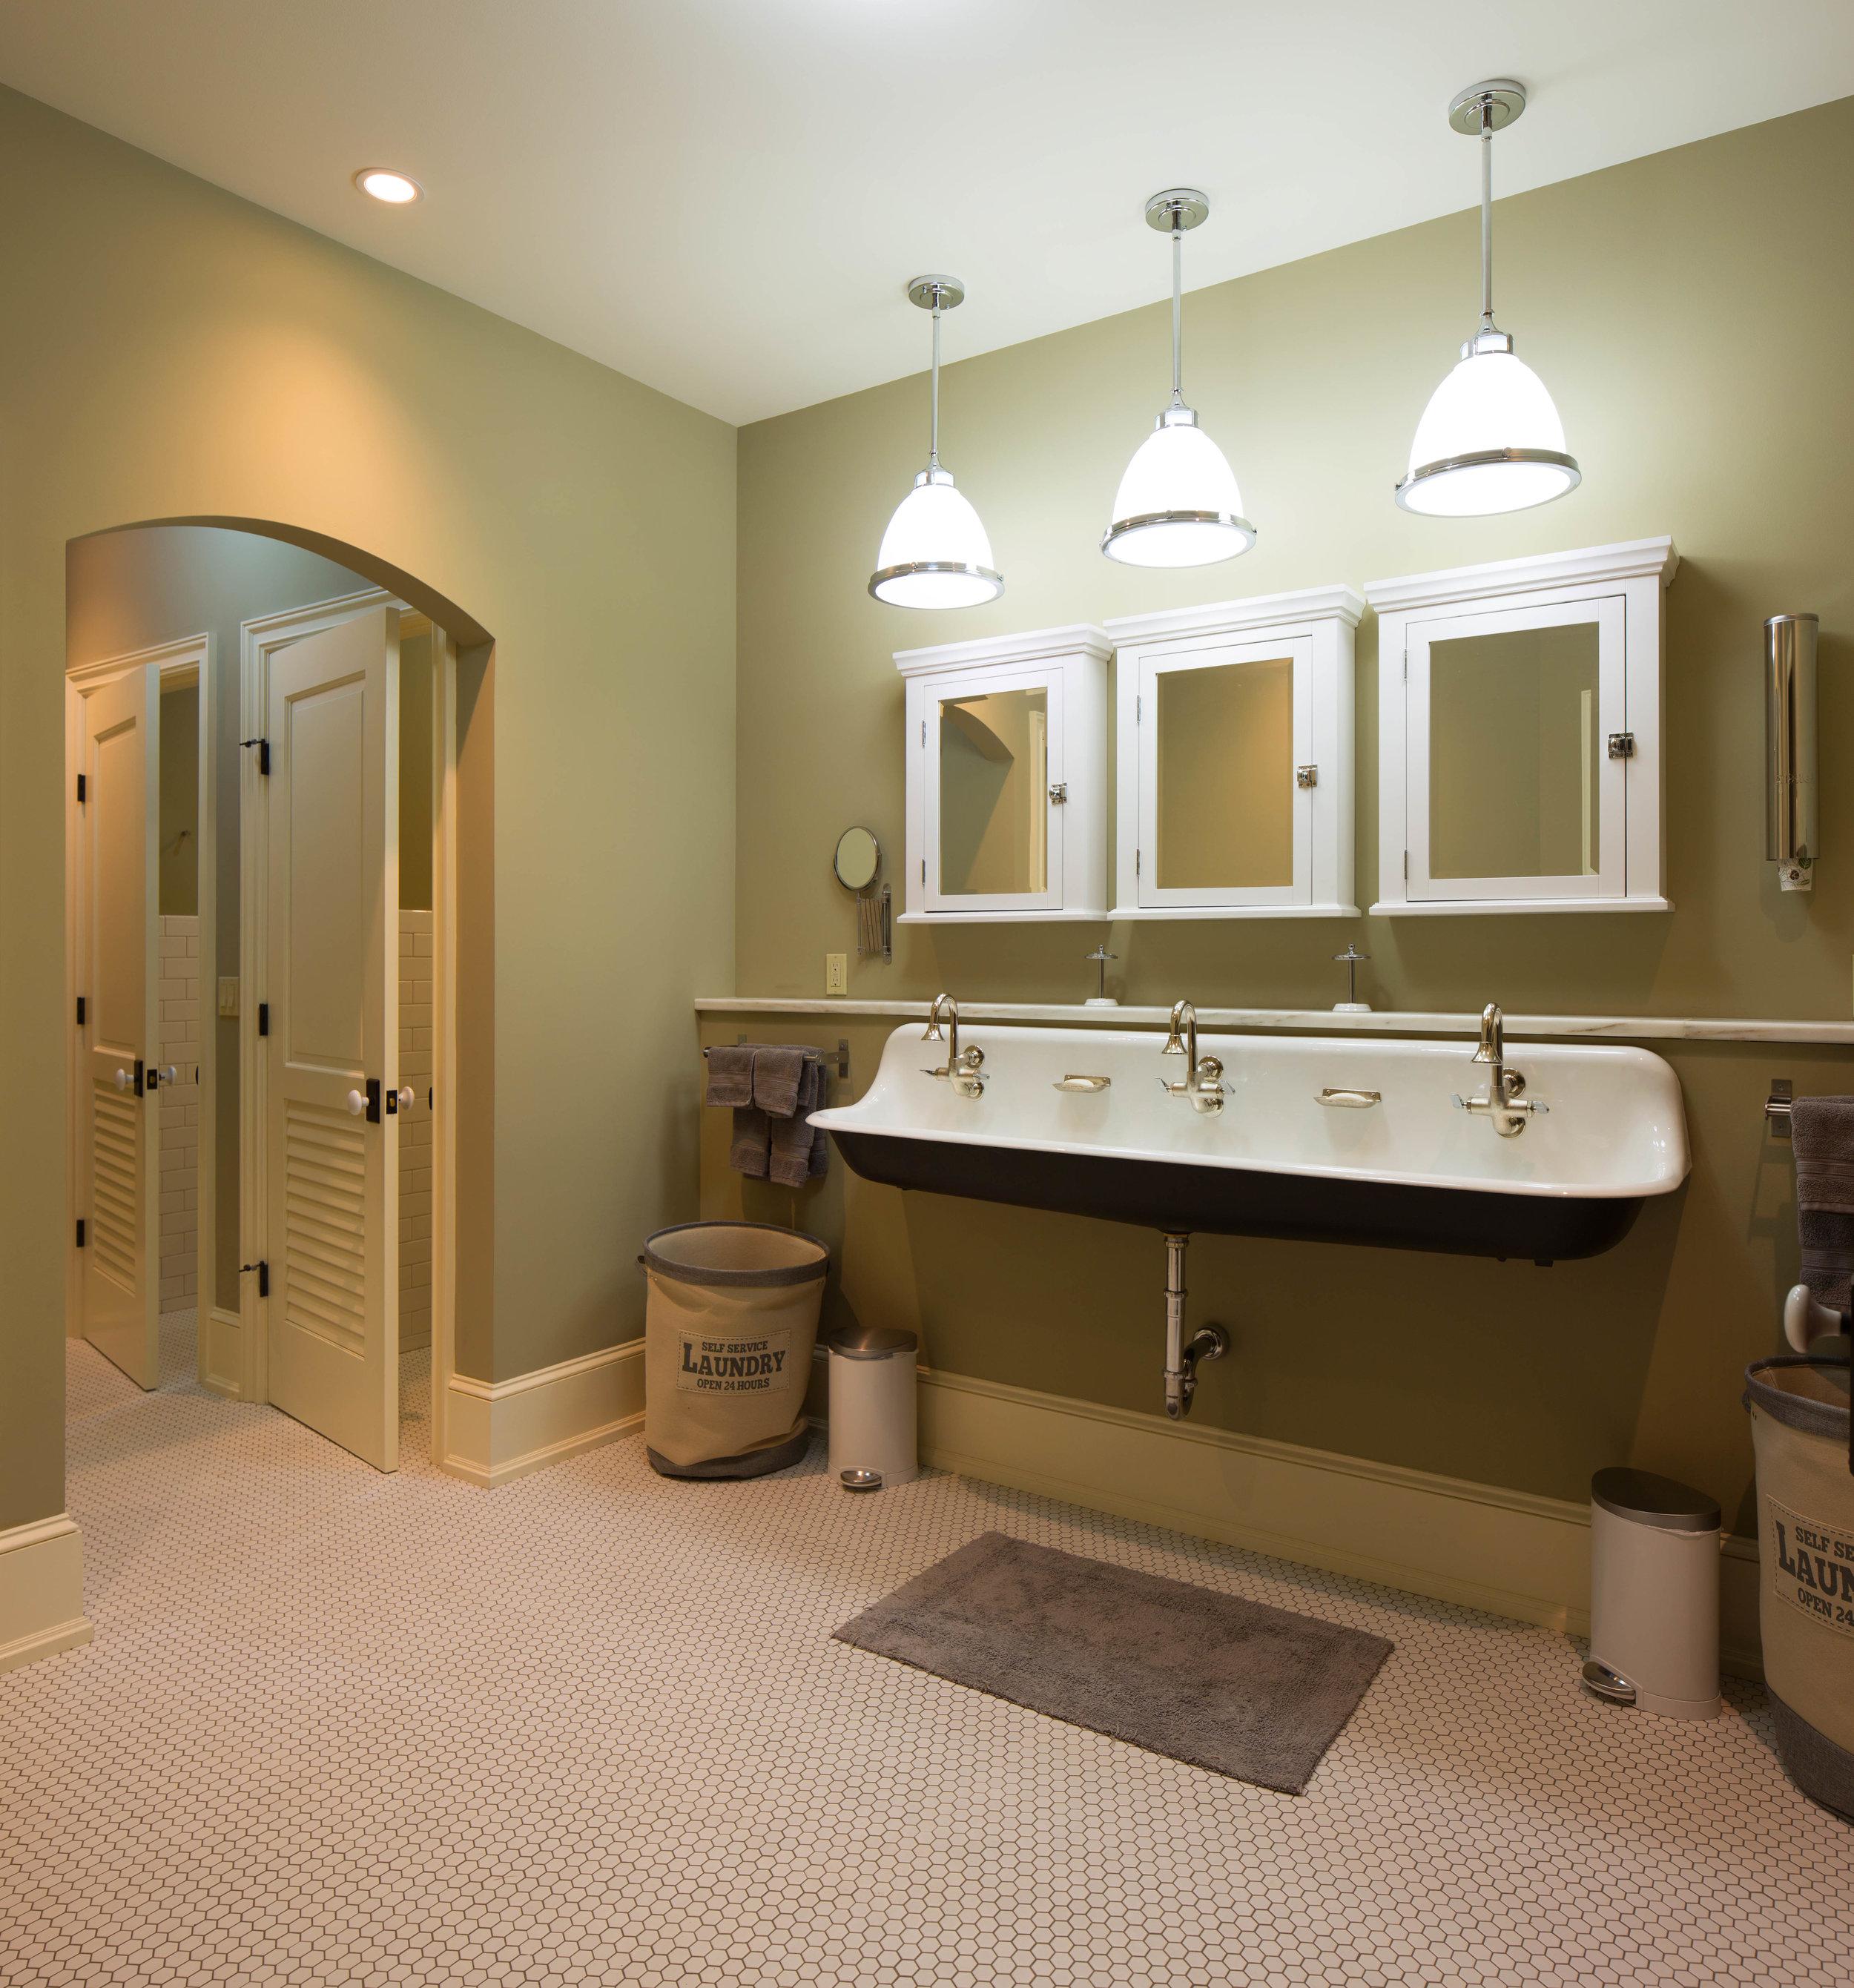 Corcoran-2657 Bunk Bathroom.jpg